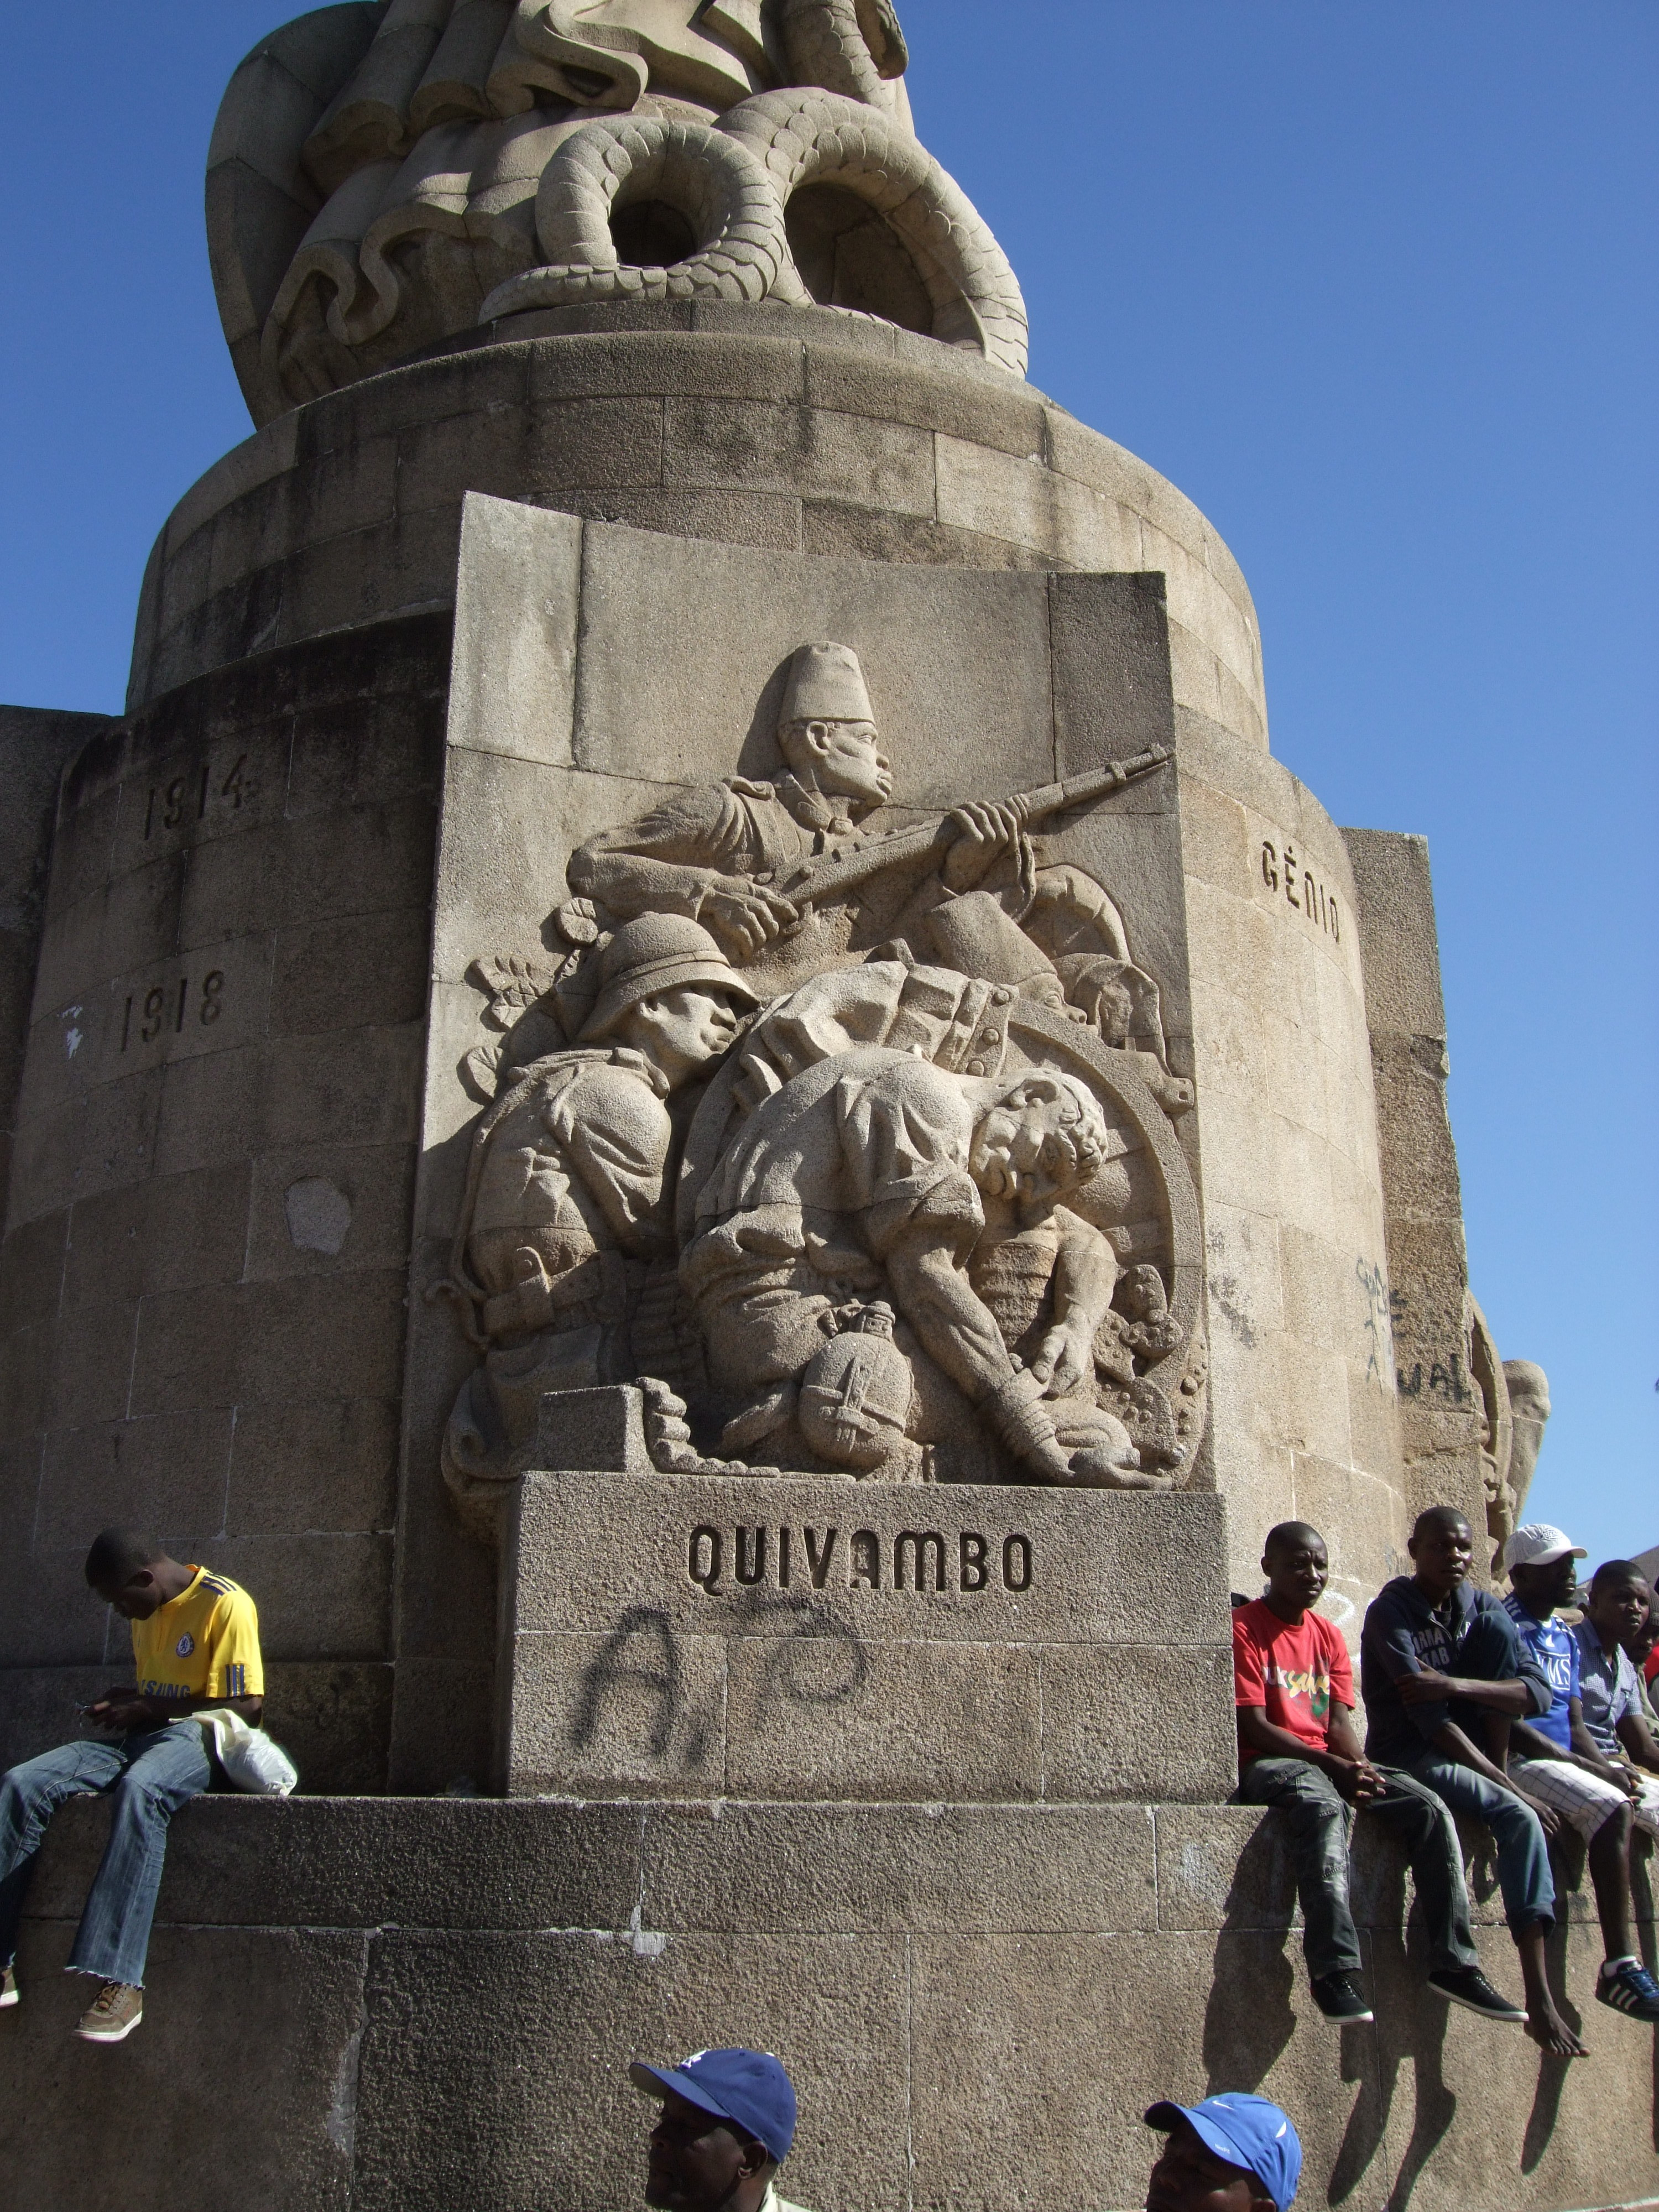 Plaque for Quivambo